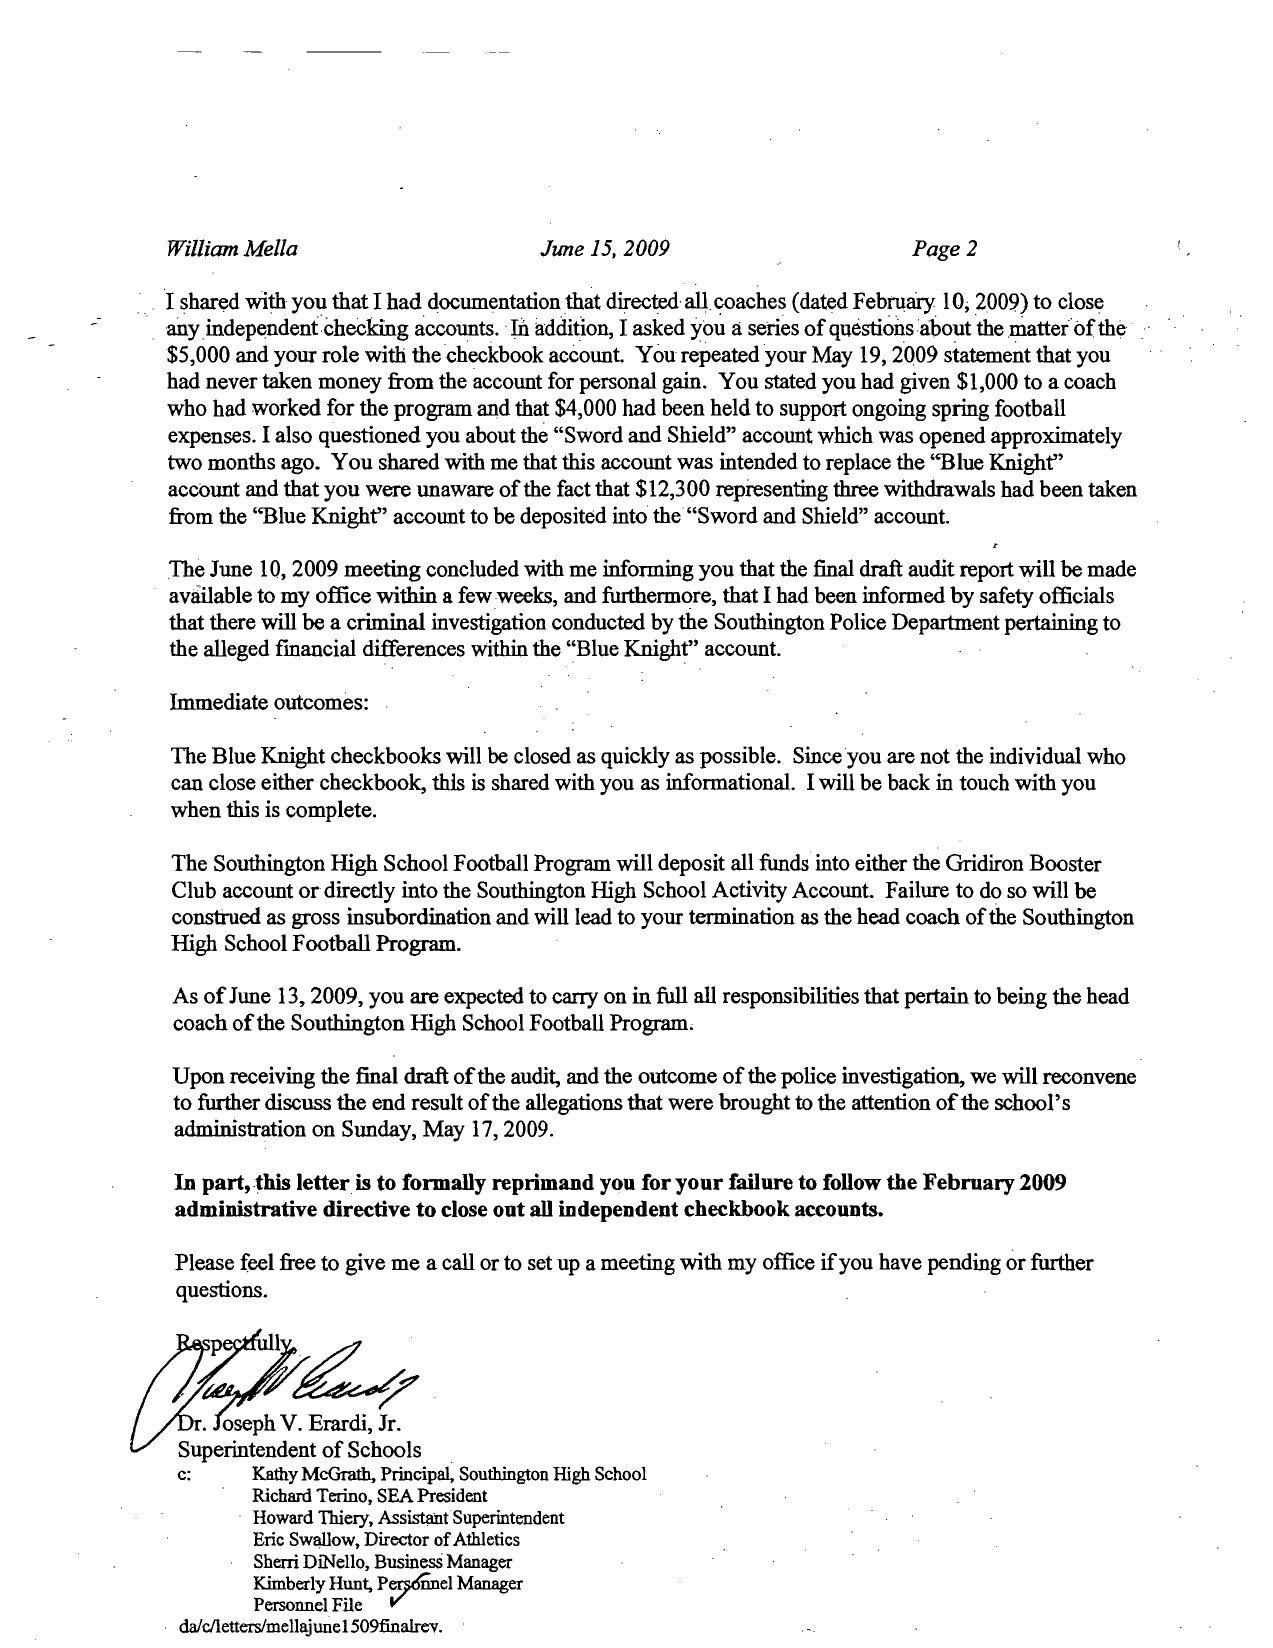 letter from superintendent erardi to william mella by record letter from superintendent erardi to william mella by record journal page 2 issuu